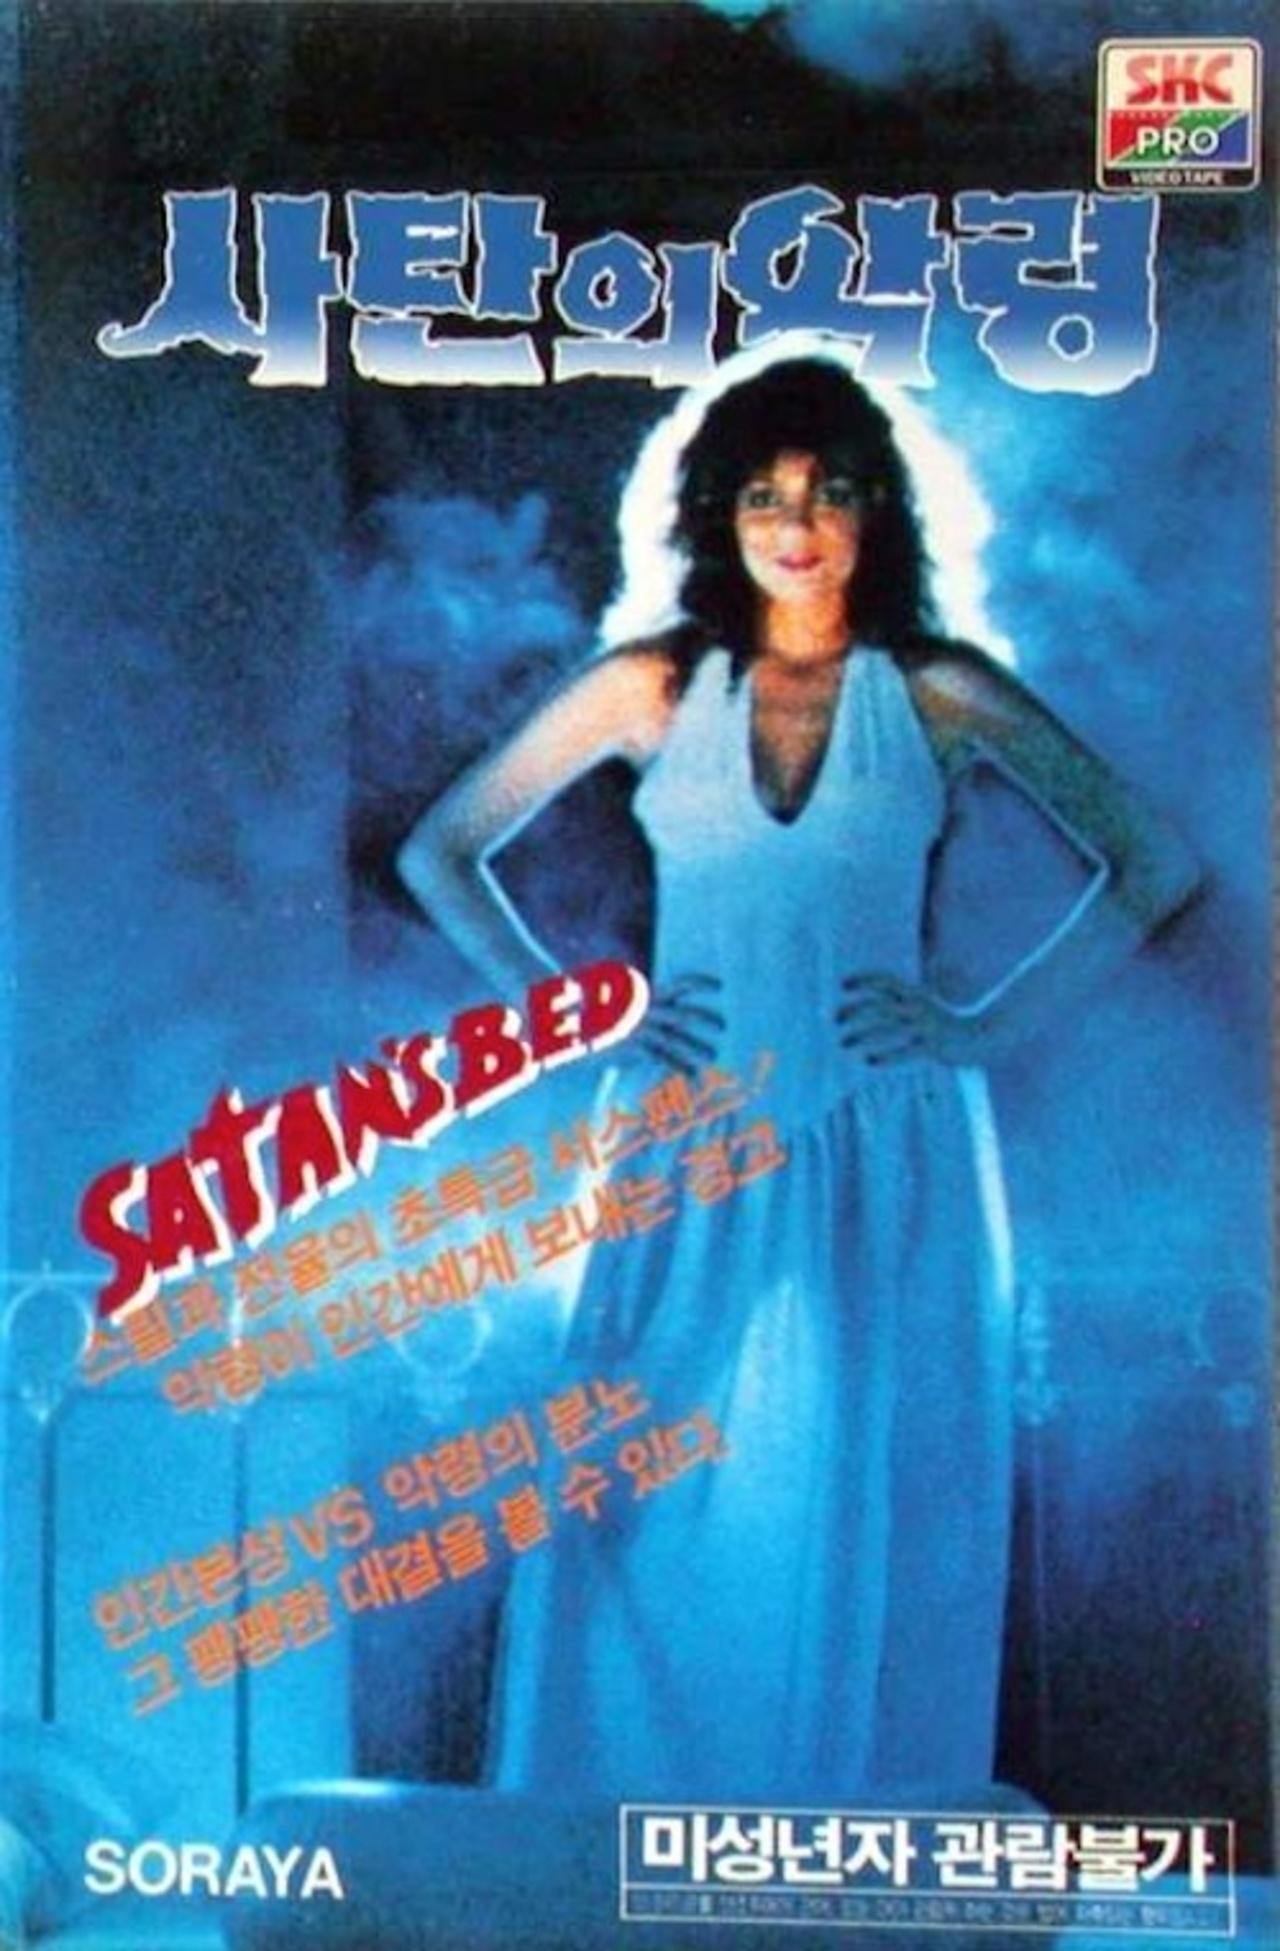 Batas Impian Ranjang Setan ((1986))